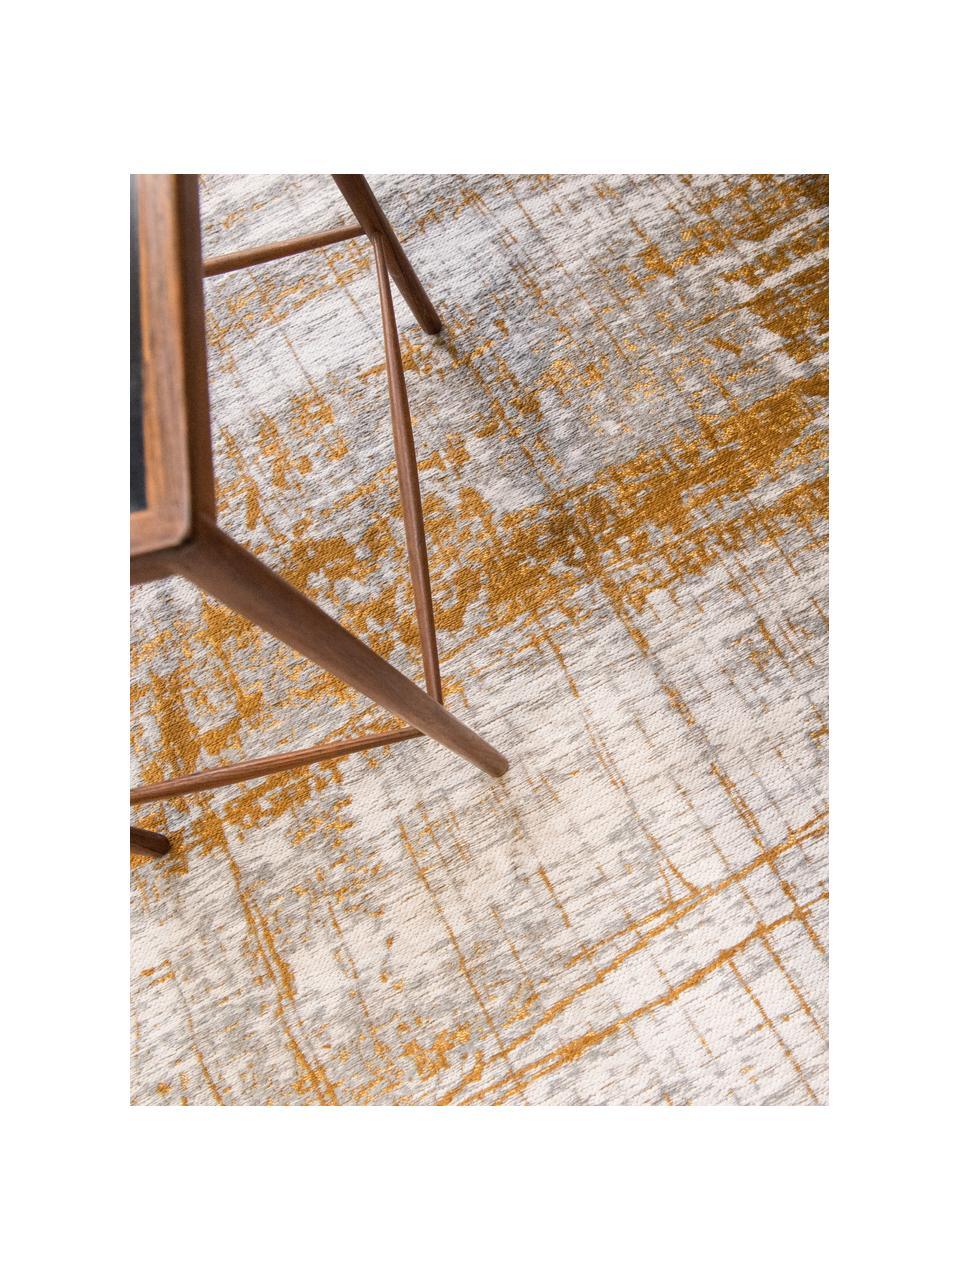 Design Teppich Griff im Vintage Style, Flor: 85%Baumwolle, 15%hochgl, Webart: Jacquard, Grau, Goldfarben, Weiß, B 200 x L 280 cm (Größe L)